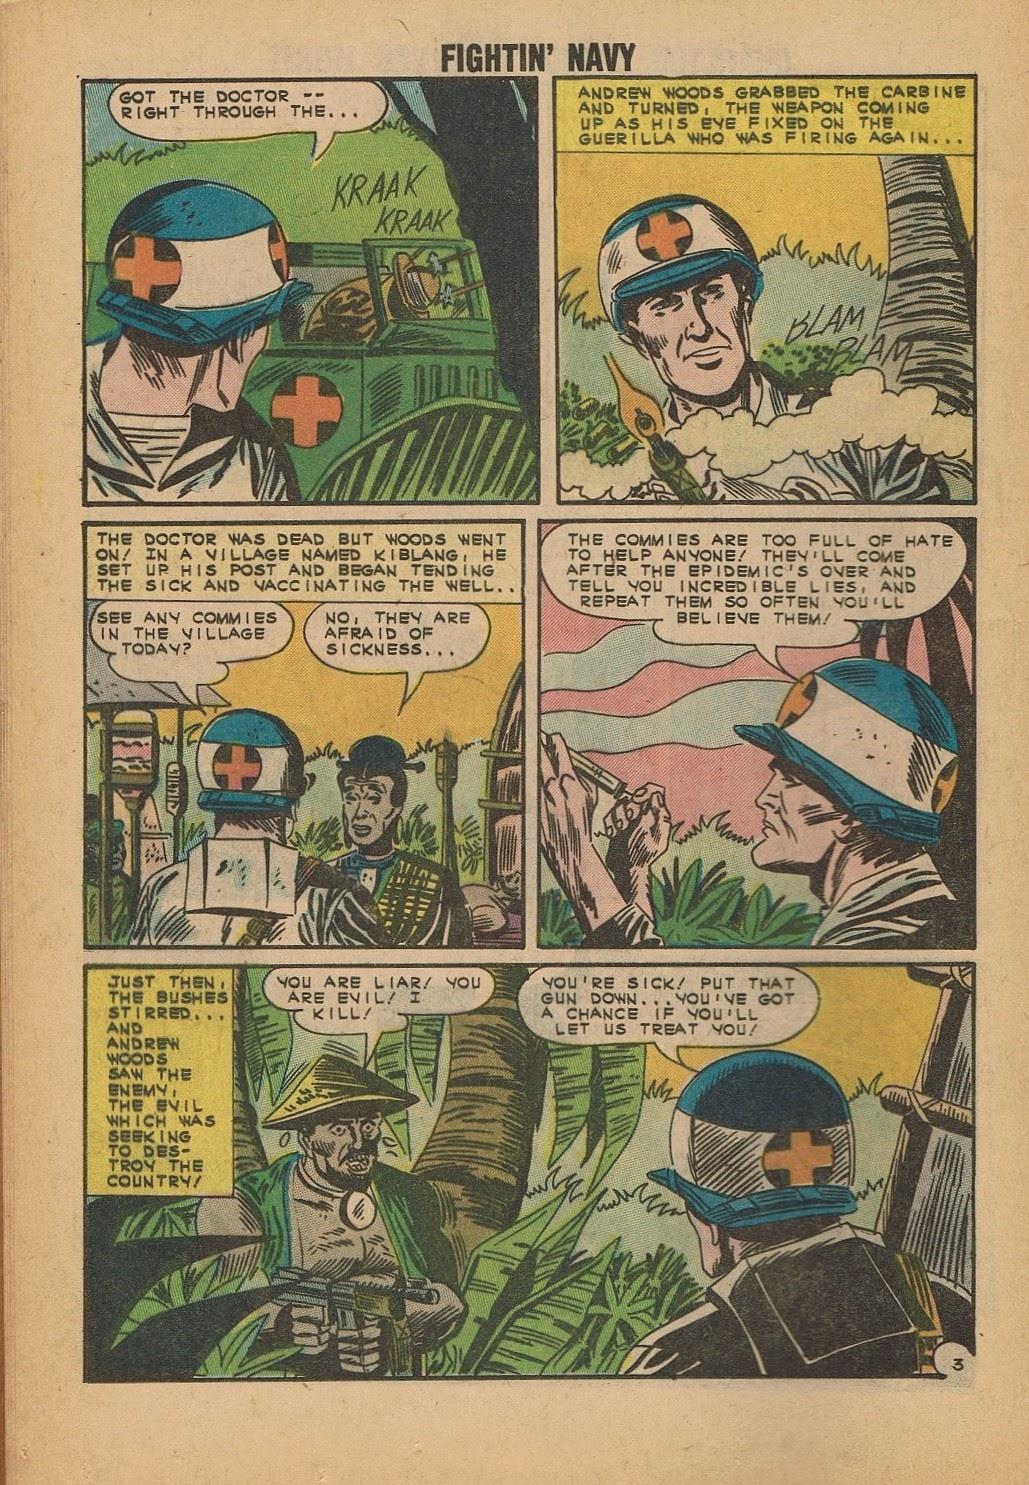 Read online Fightin' Navy comic -  Issue #112 - 12